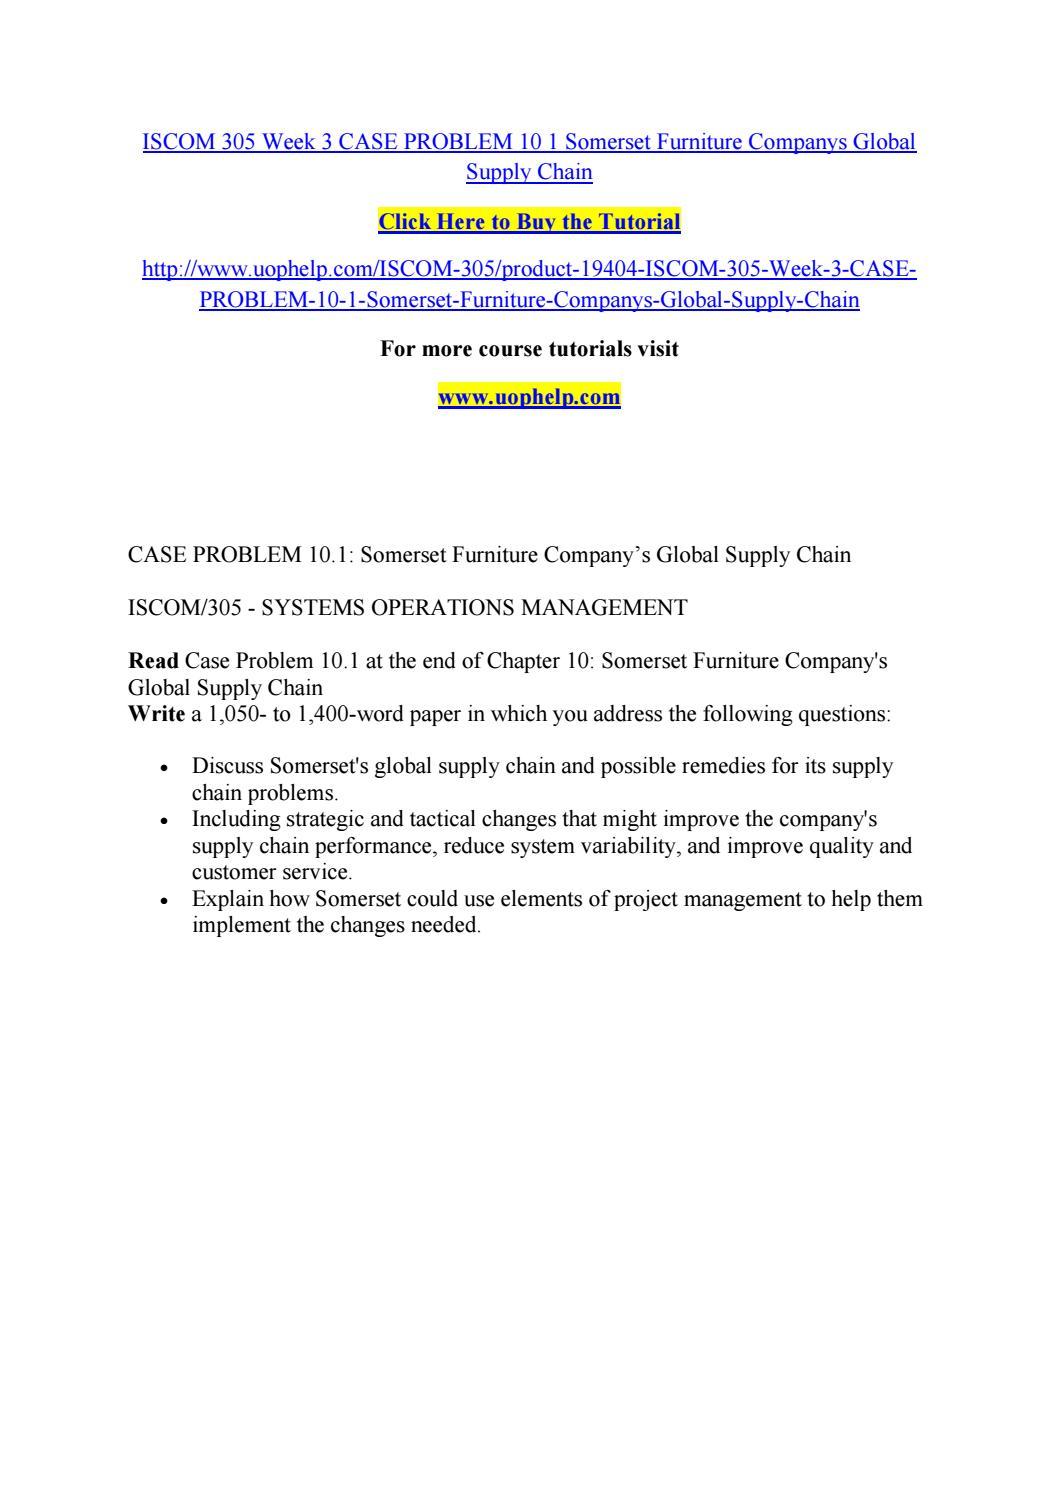 Research proposal格式参考_word文档在线阅读与下载 CSC